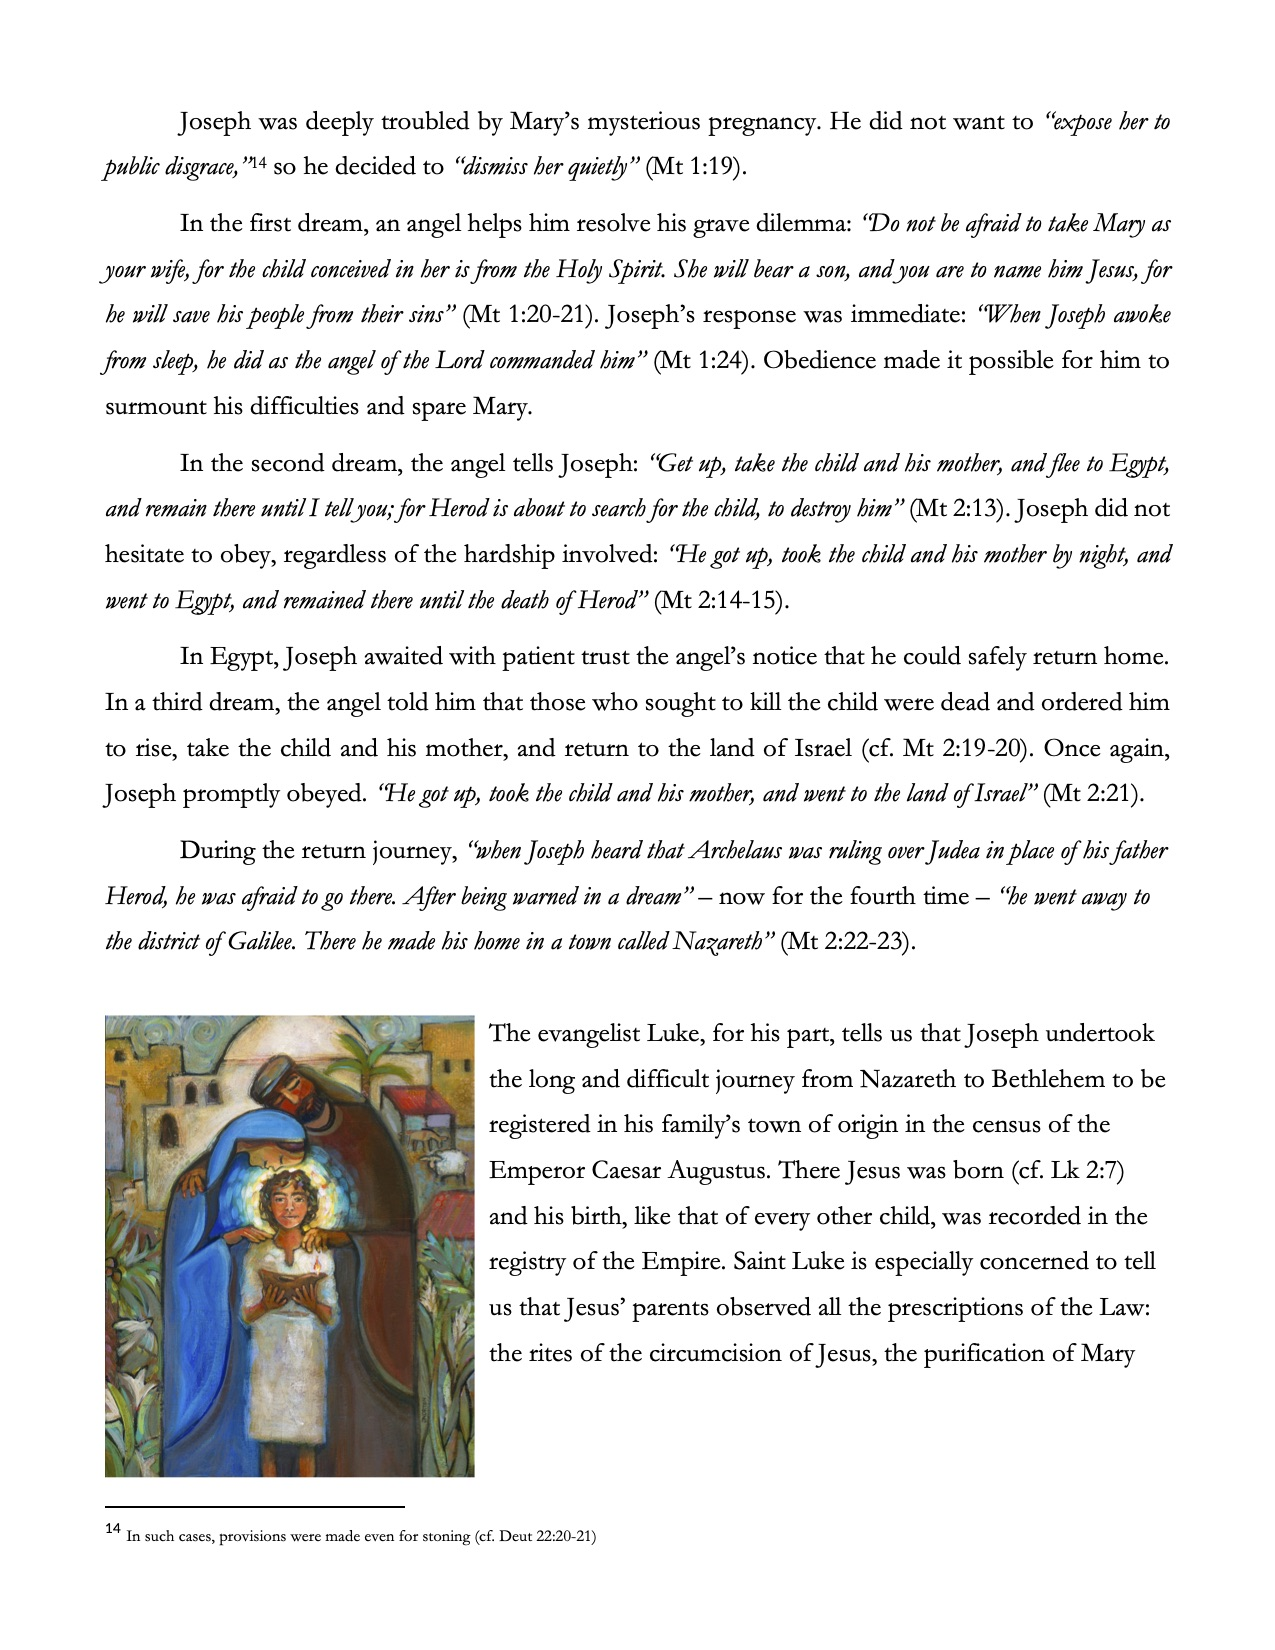 06-APOSTOLIC LETTER